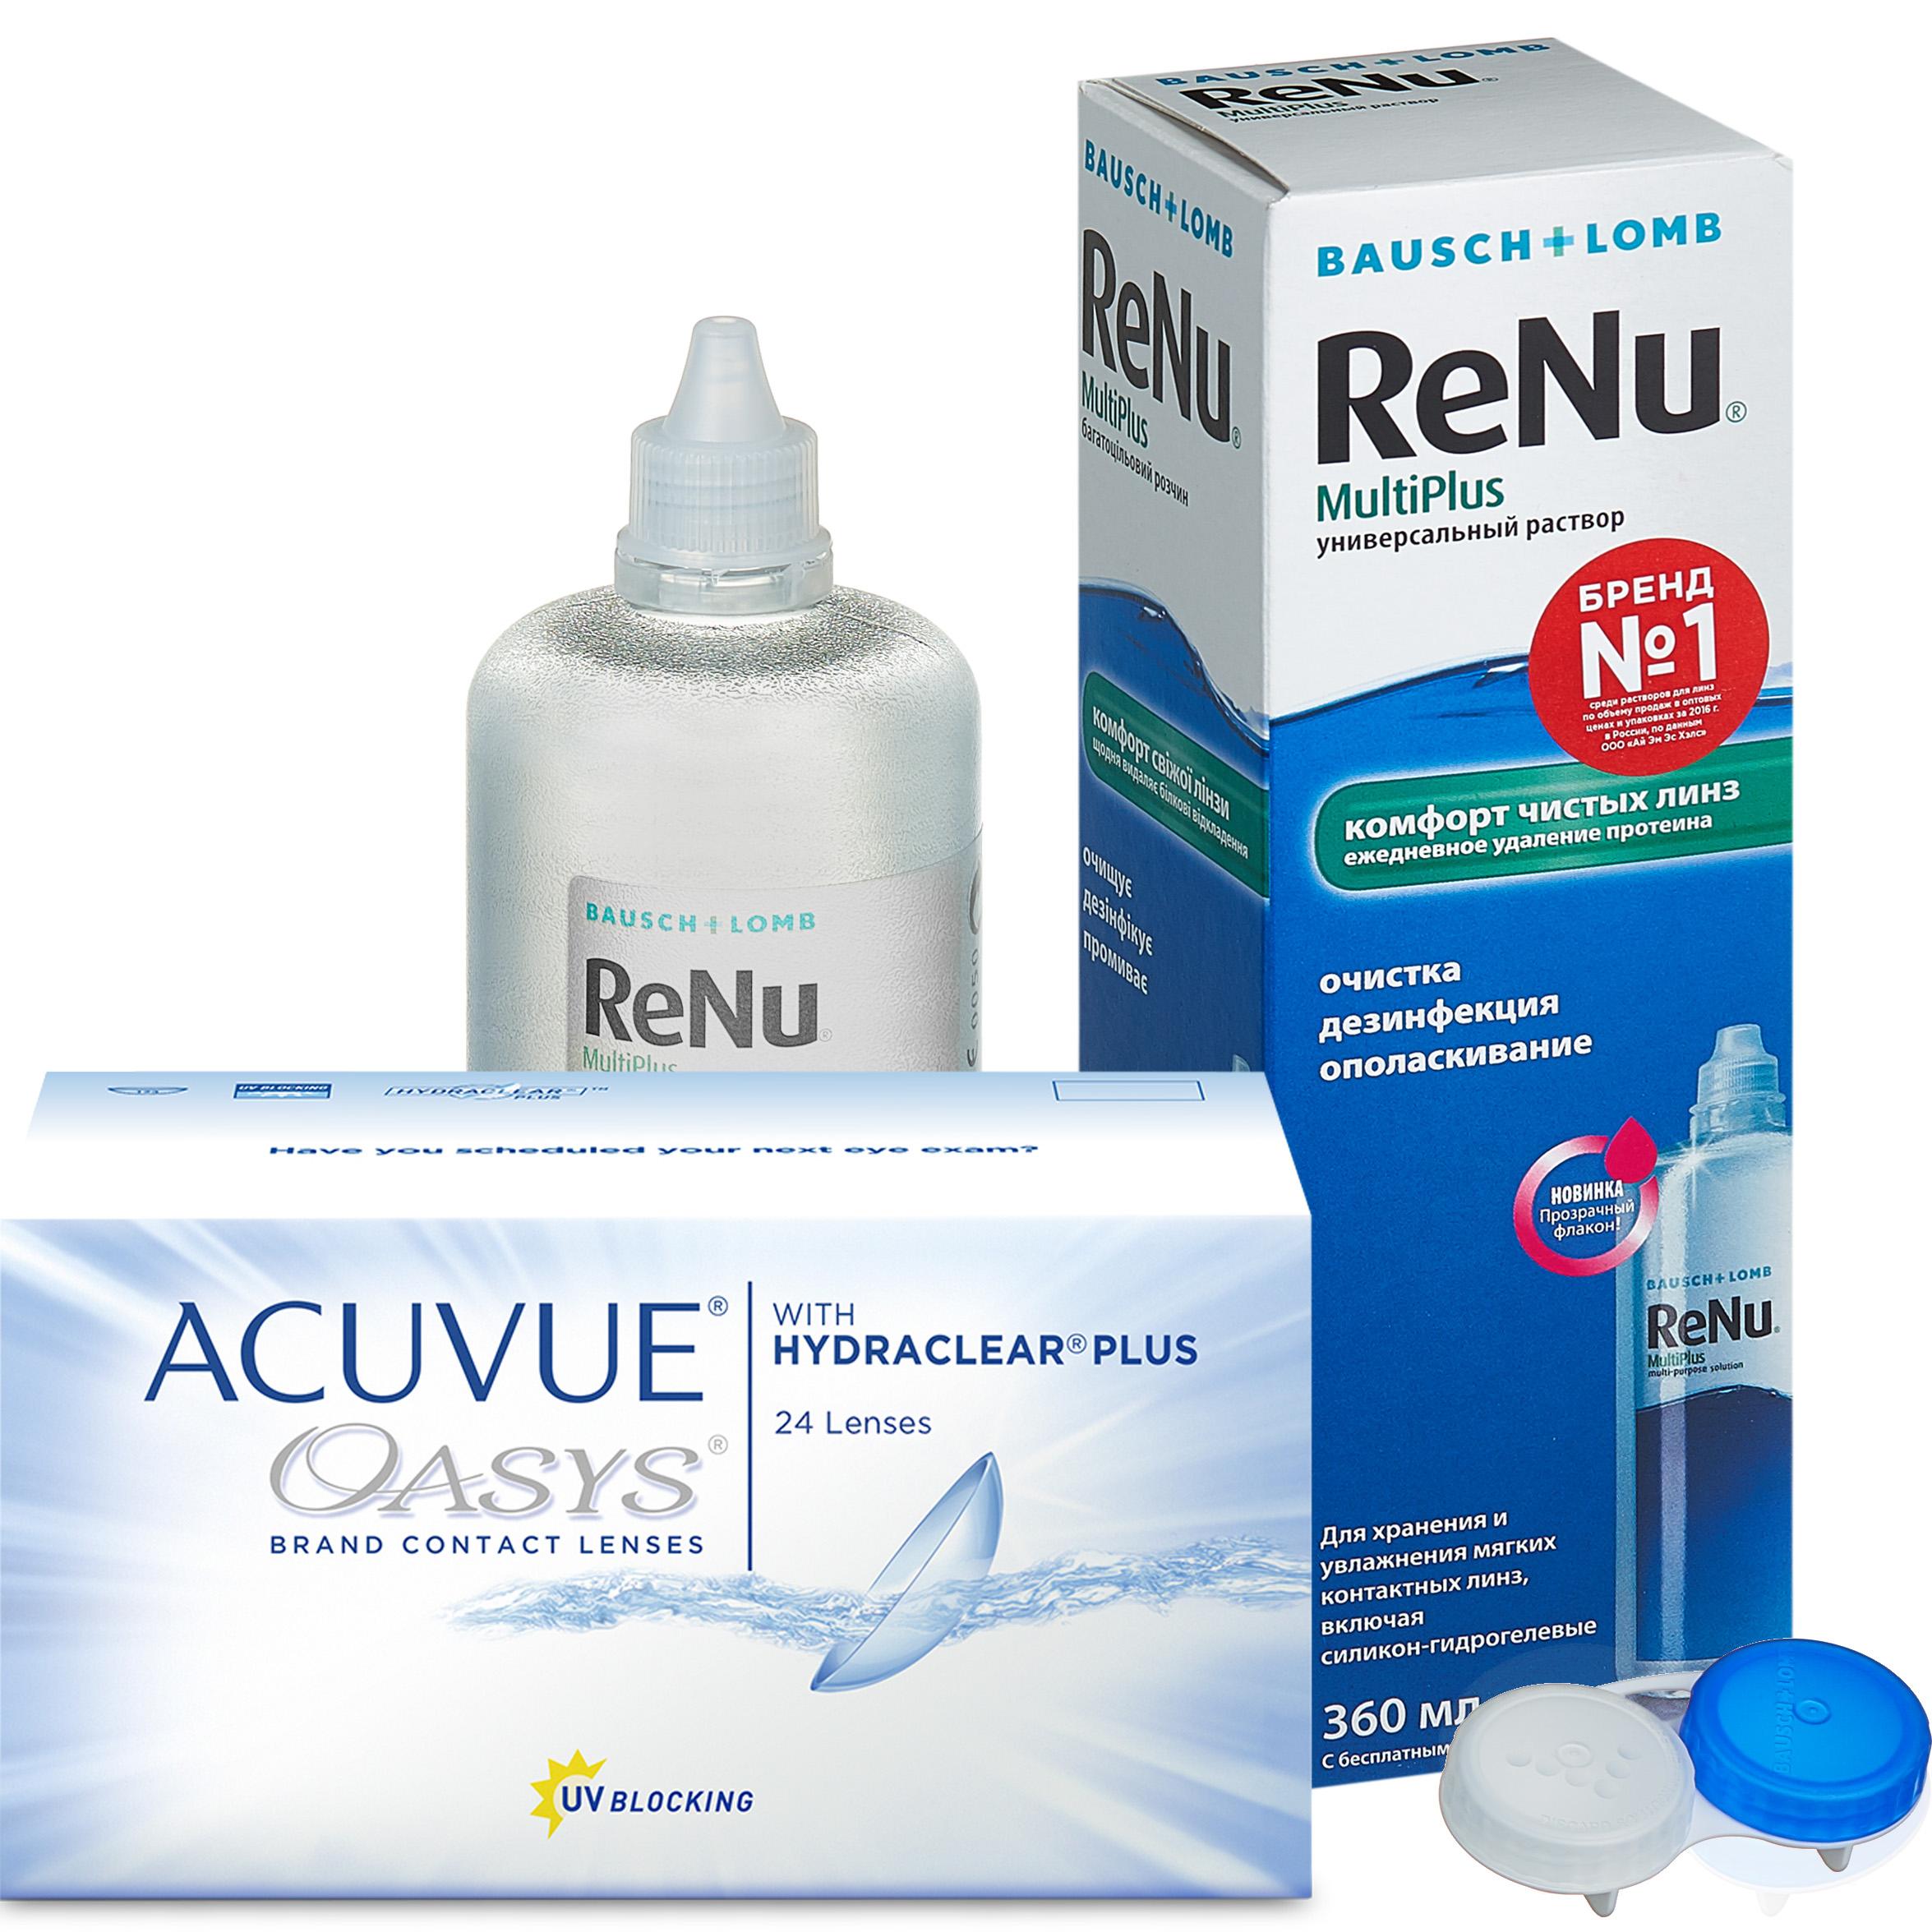 Купить Oasys with Hydraclear Plus 24 линзы + ReNu MultiPlus, Линзы Acuvue Oasys with Hydraclear Plus 24 линзы R 8.4 +2, 00 + ReNu Multi Plus 360 мл